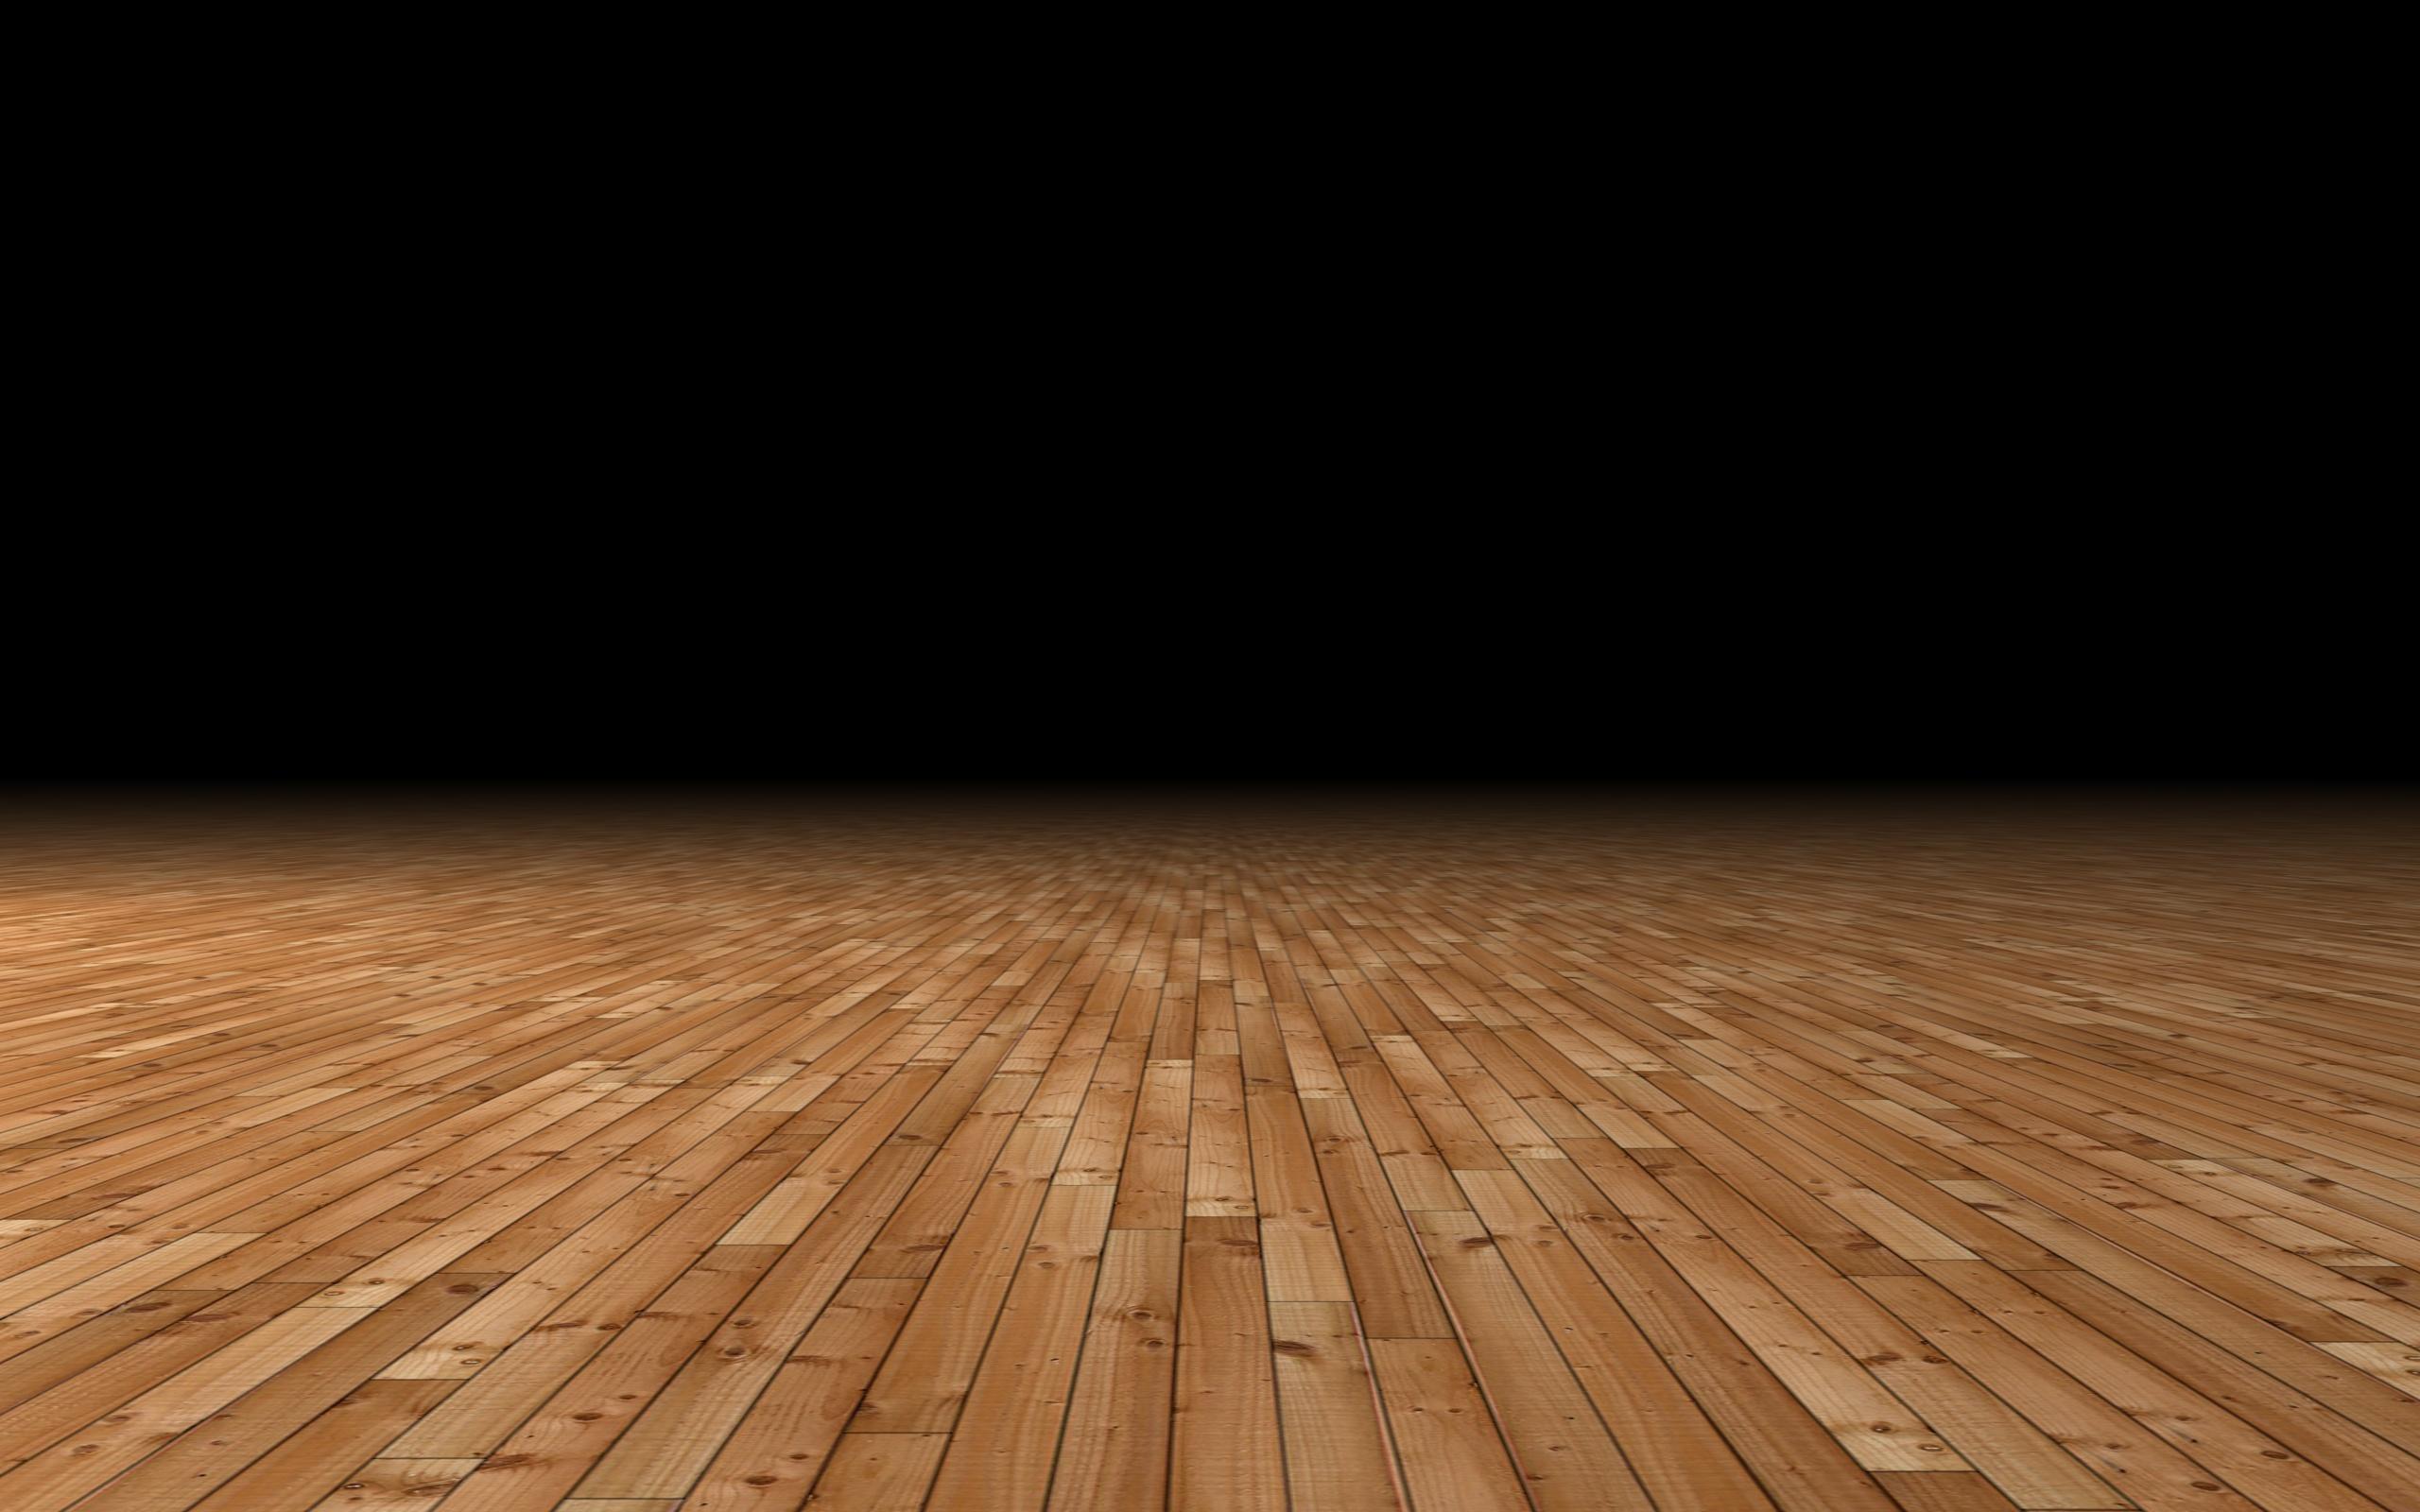 Basketball Court Wood Background 7267 Best Wallpapers Basketball Court 2560x1600